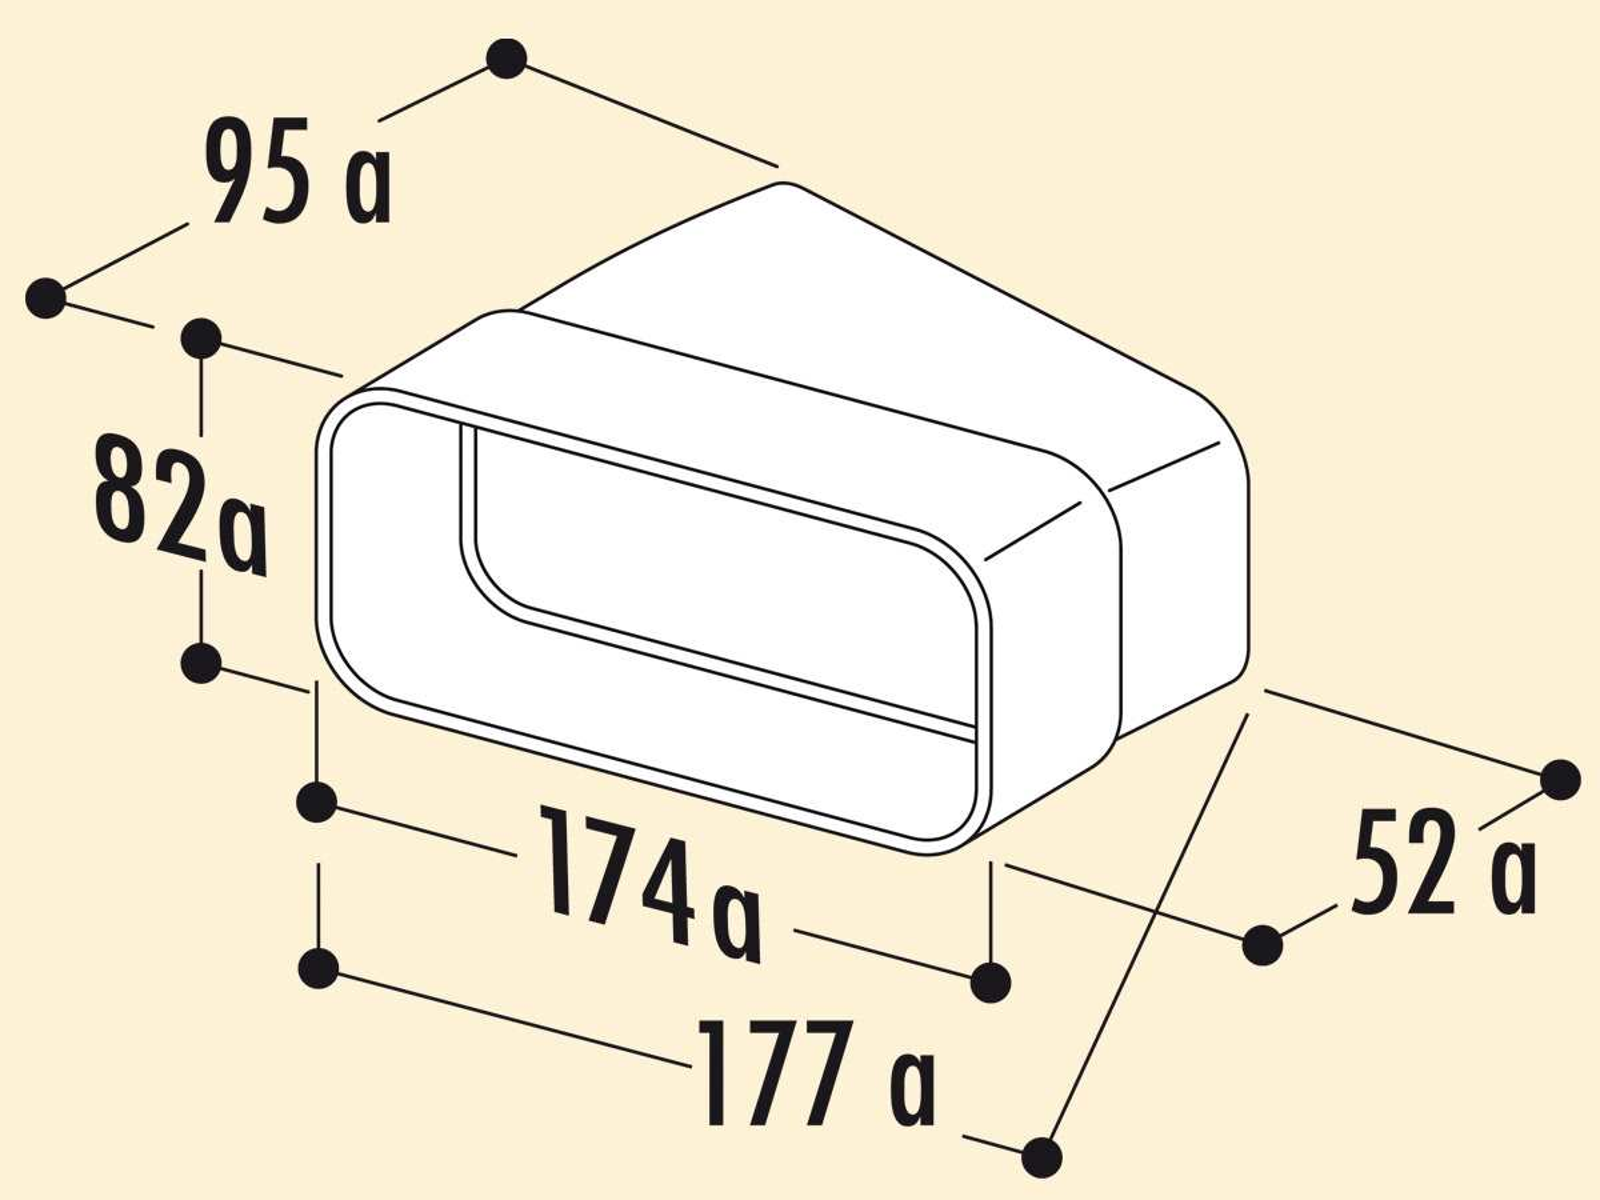 Compair 403.3.012 MF-RBH 15 Rohrbogen horizontal 15°